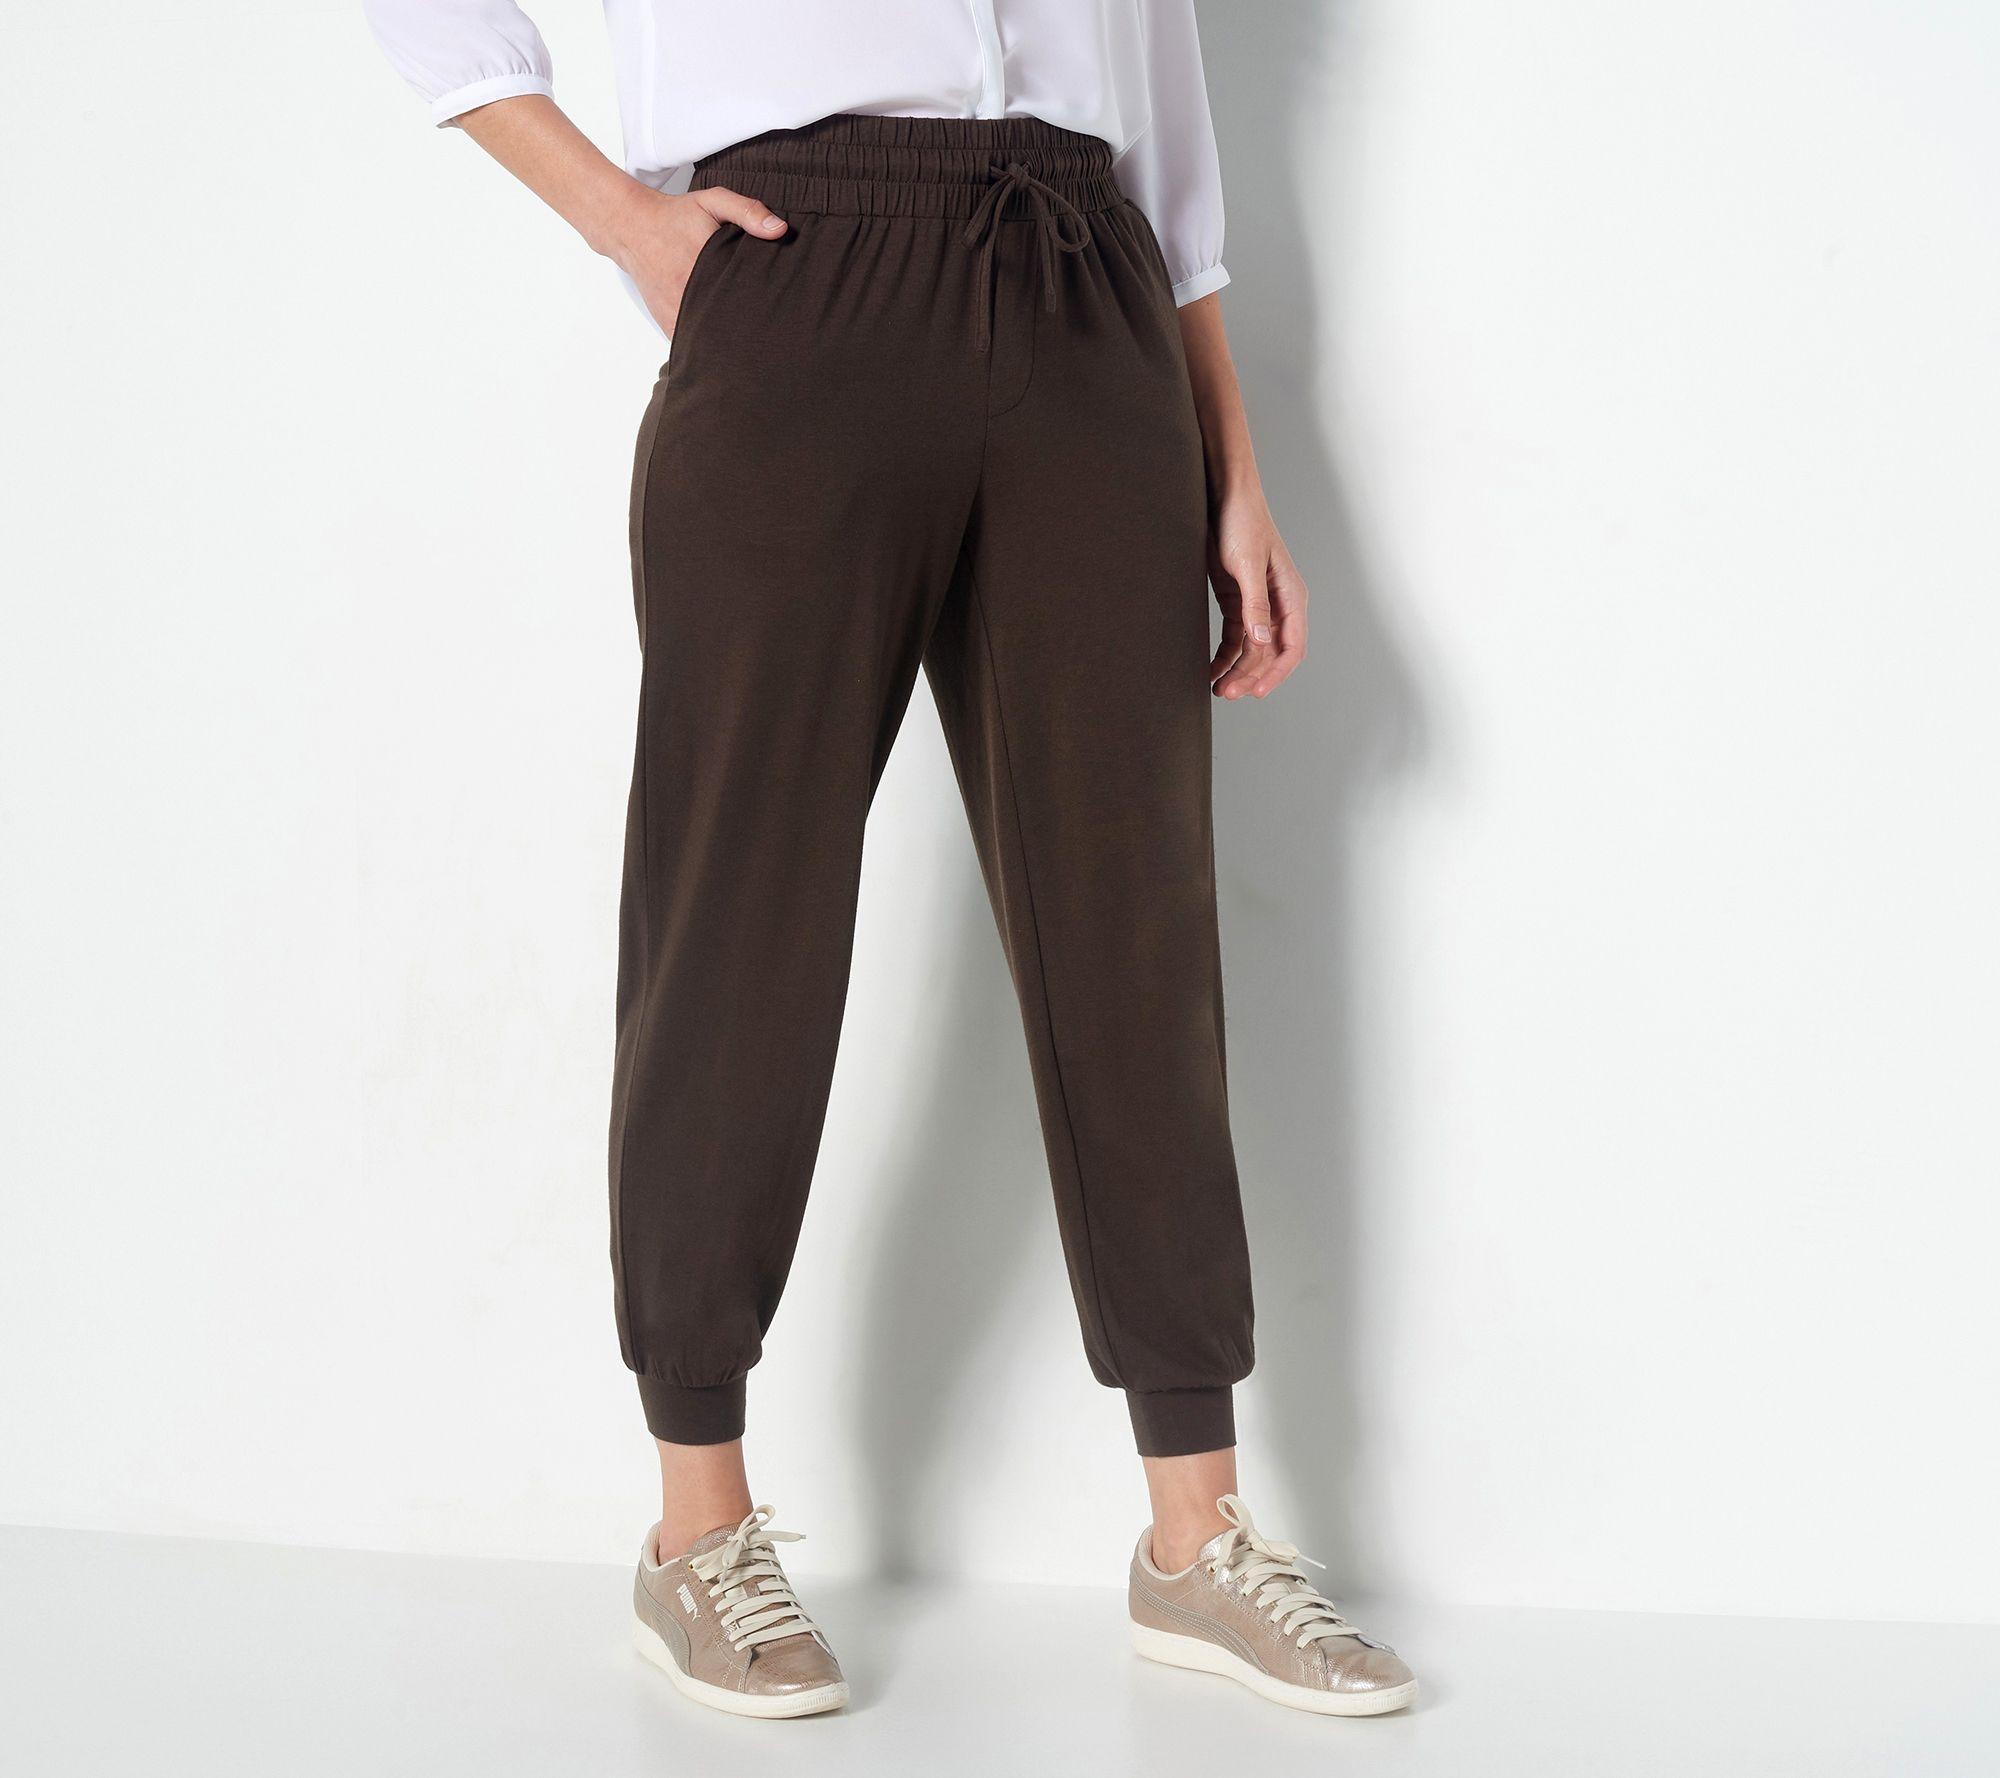 3755a44278f06f AnyBody Loungewear Cozy Knit Jogger Pants — QVC.com